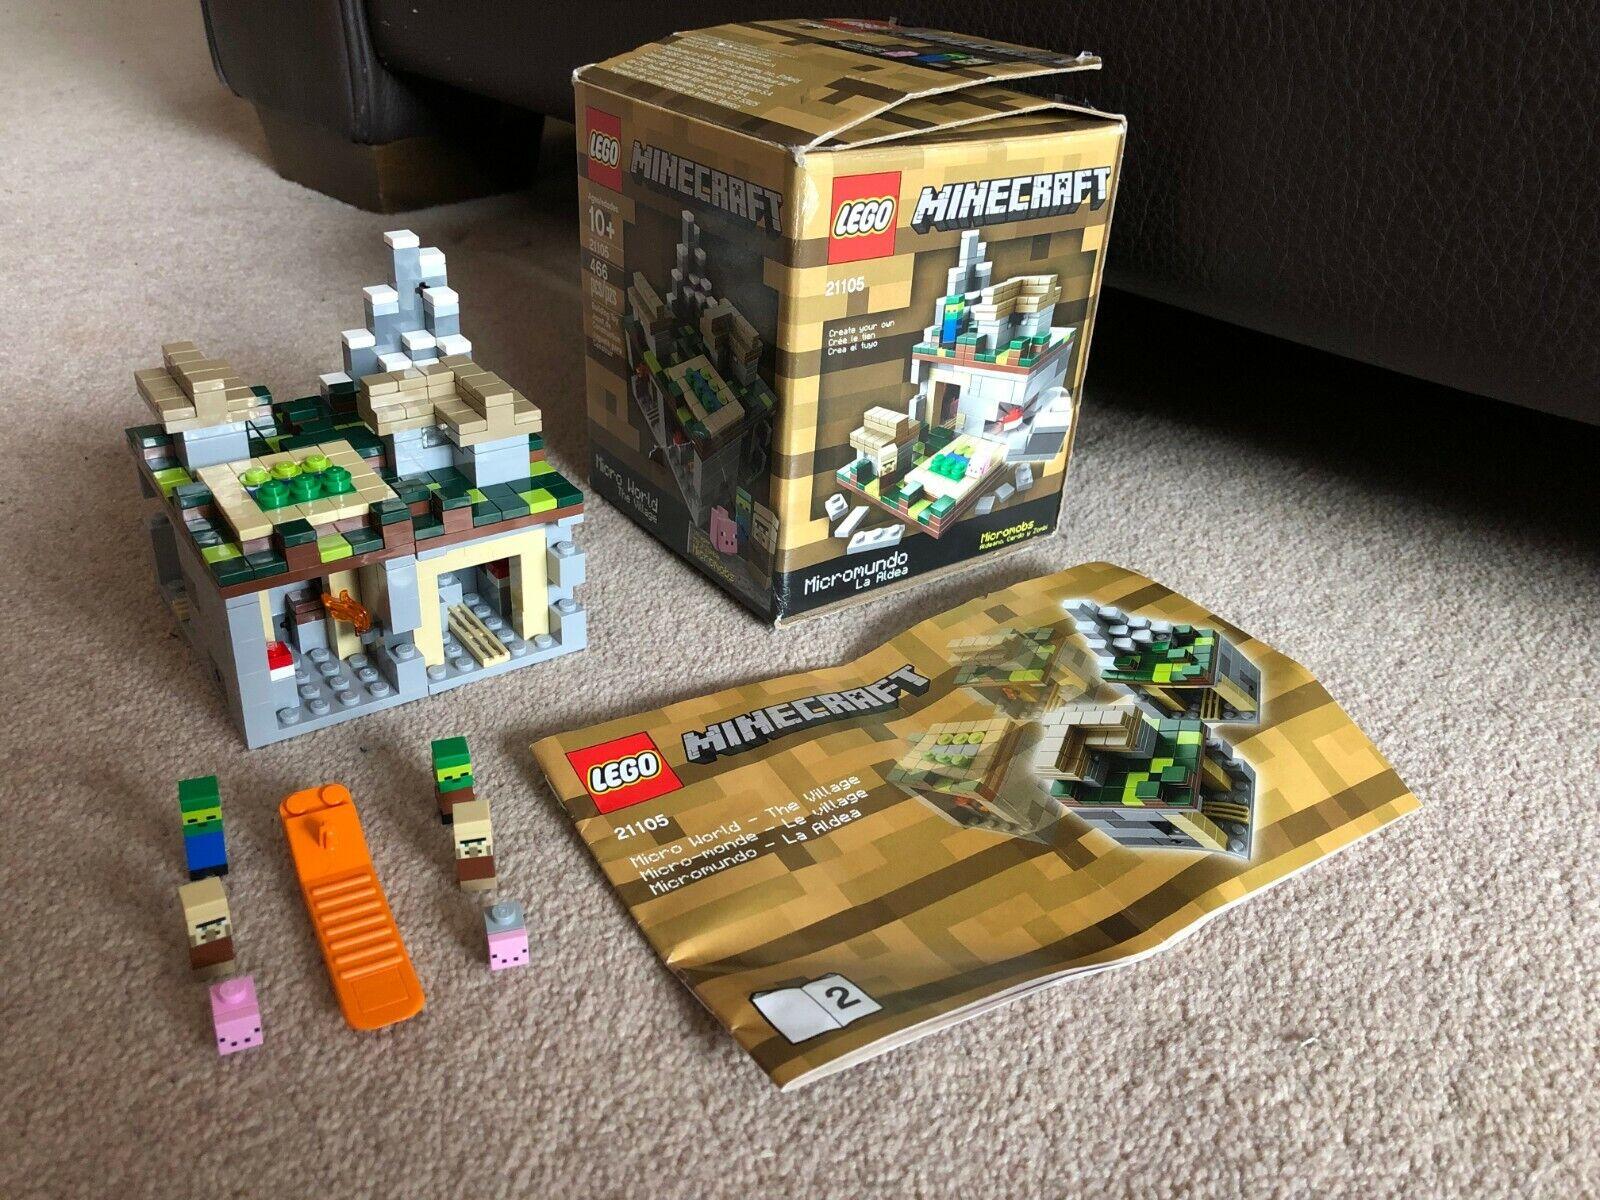 LEGO Minecraft 21105 - Micro World Lego In Box - The Village